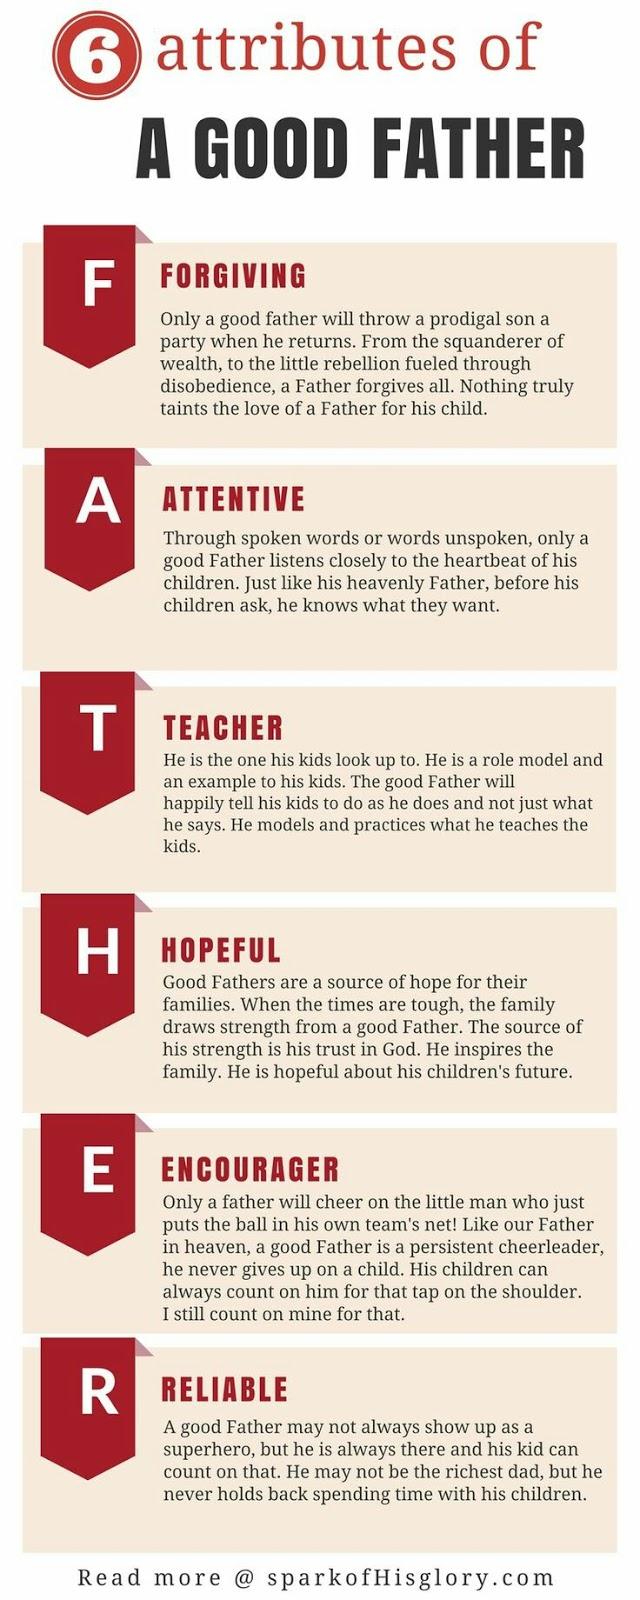 hubungan ayah dan anak lelaki, hubungan ayah dan anak perempuan, hubungan ayah dan anak dalam islam, hubungan ayah dan anak yang baik, Hubungan ayah dan anak